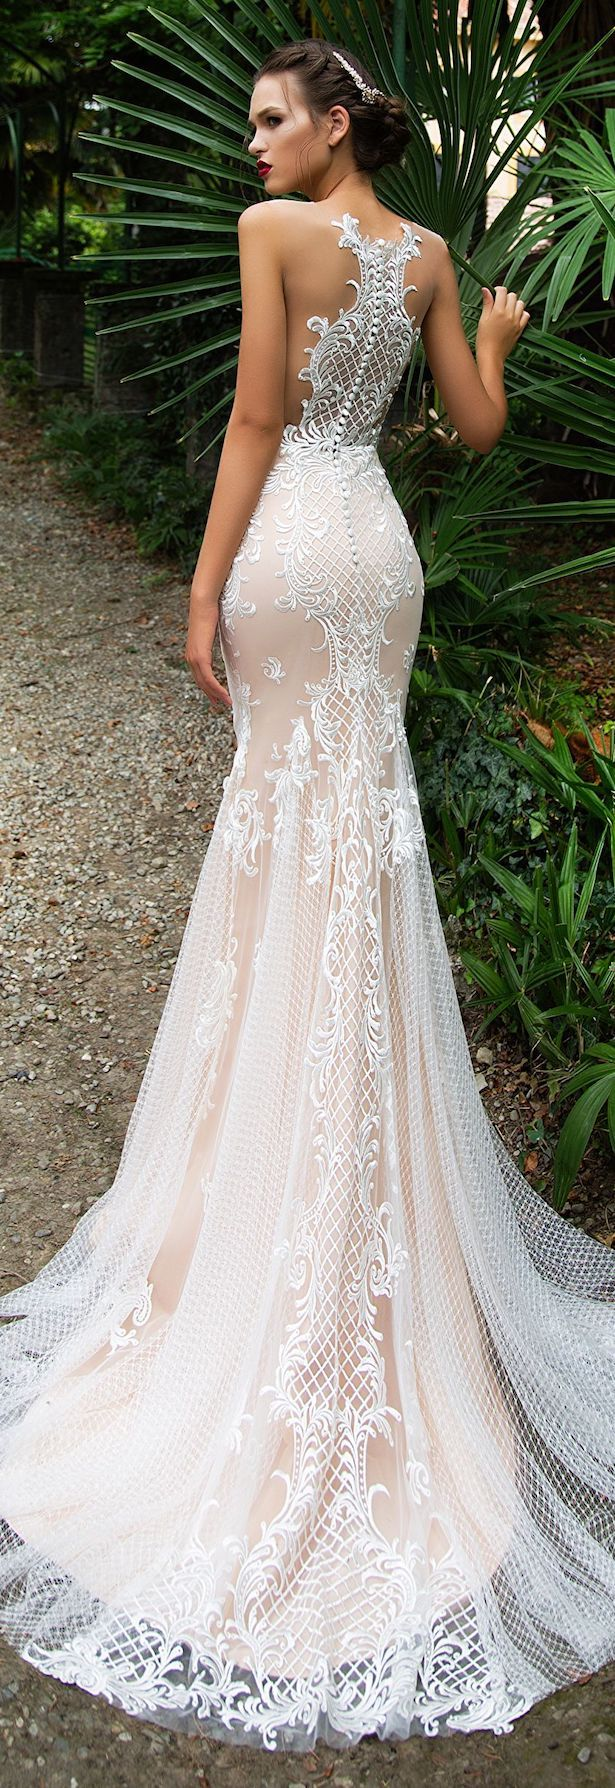 25  best ideas about Stunning wedding dresses on Pinterest ...